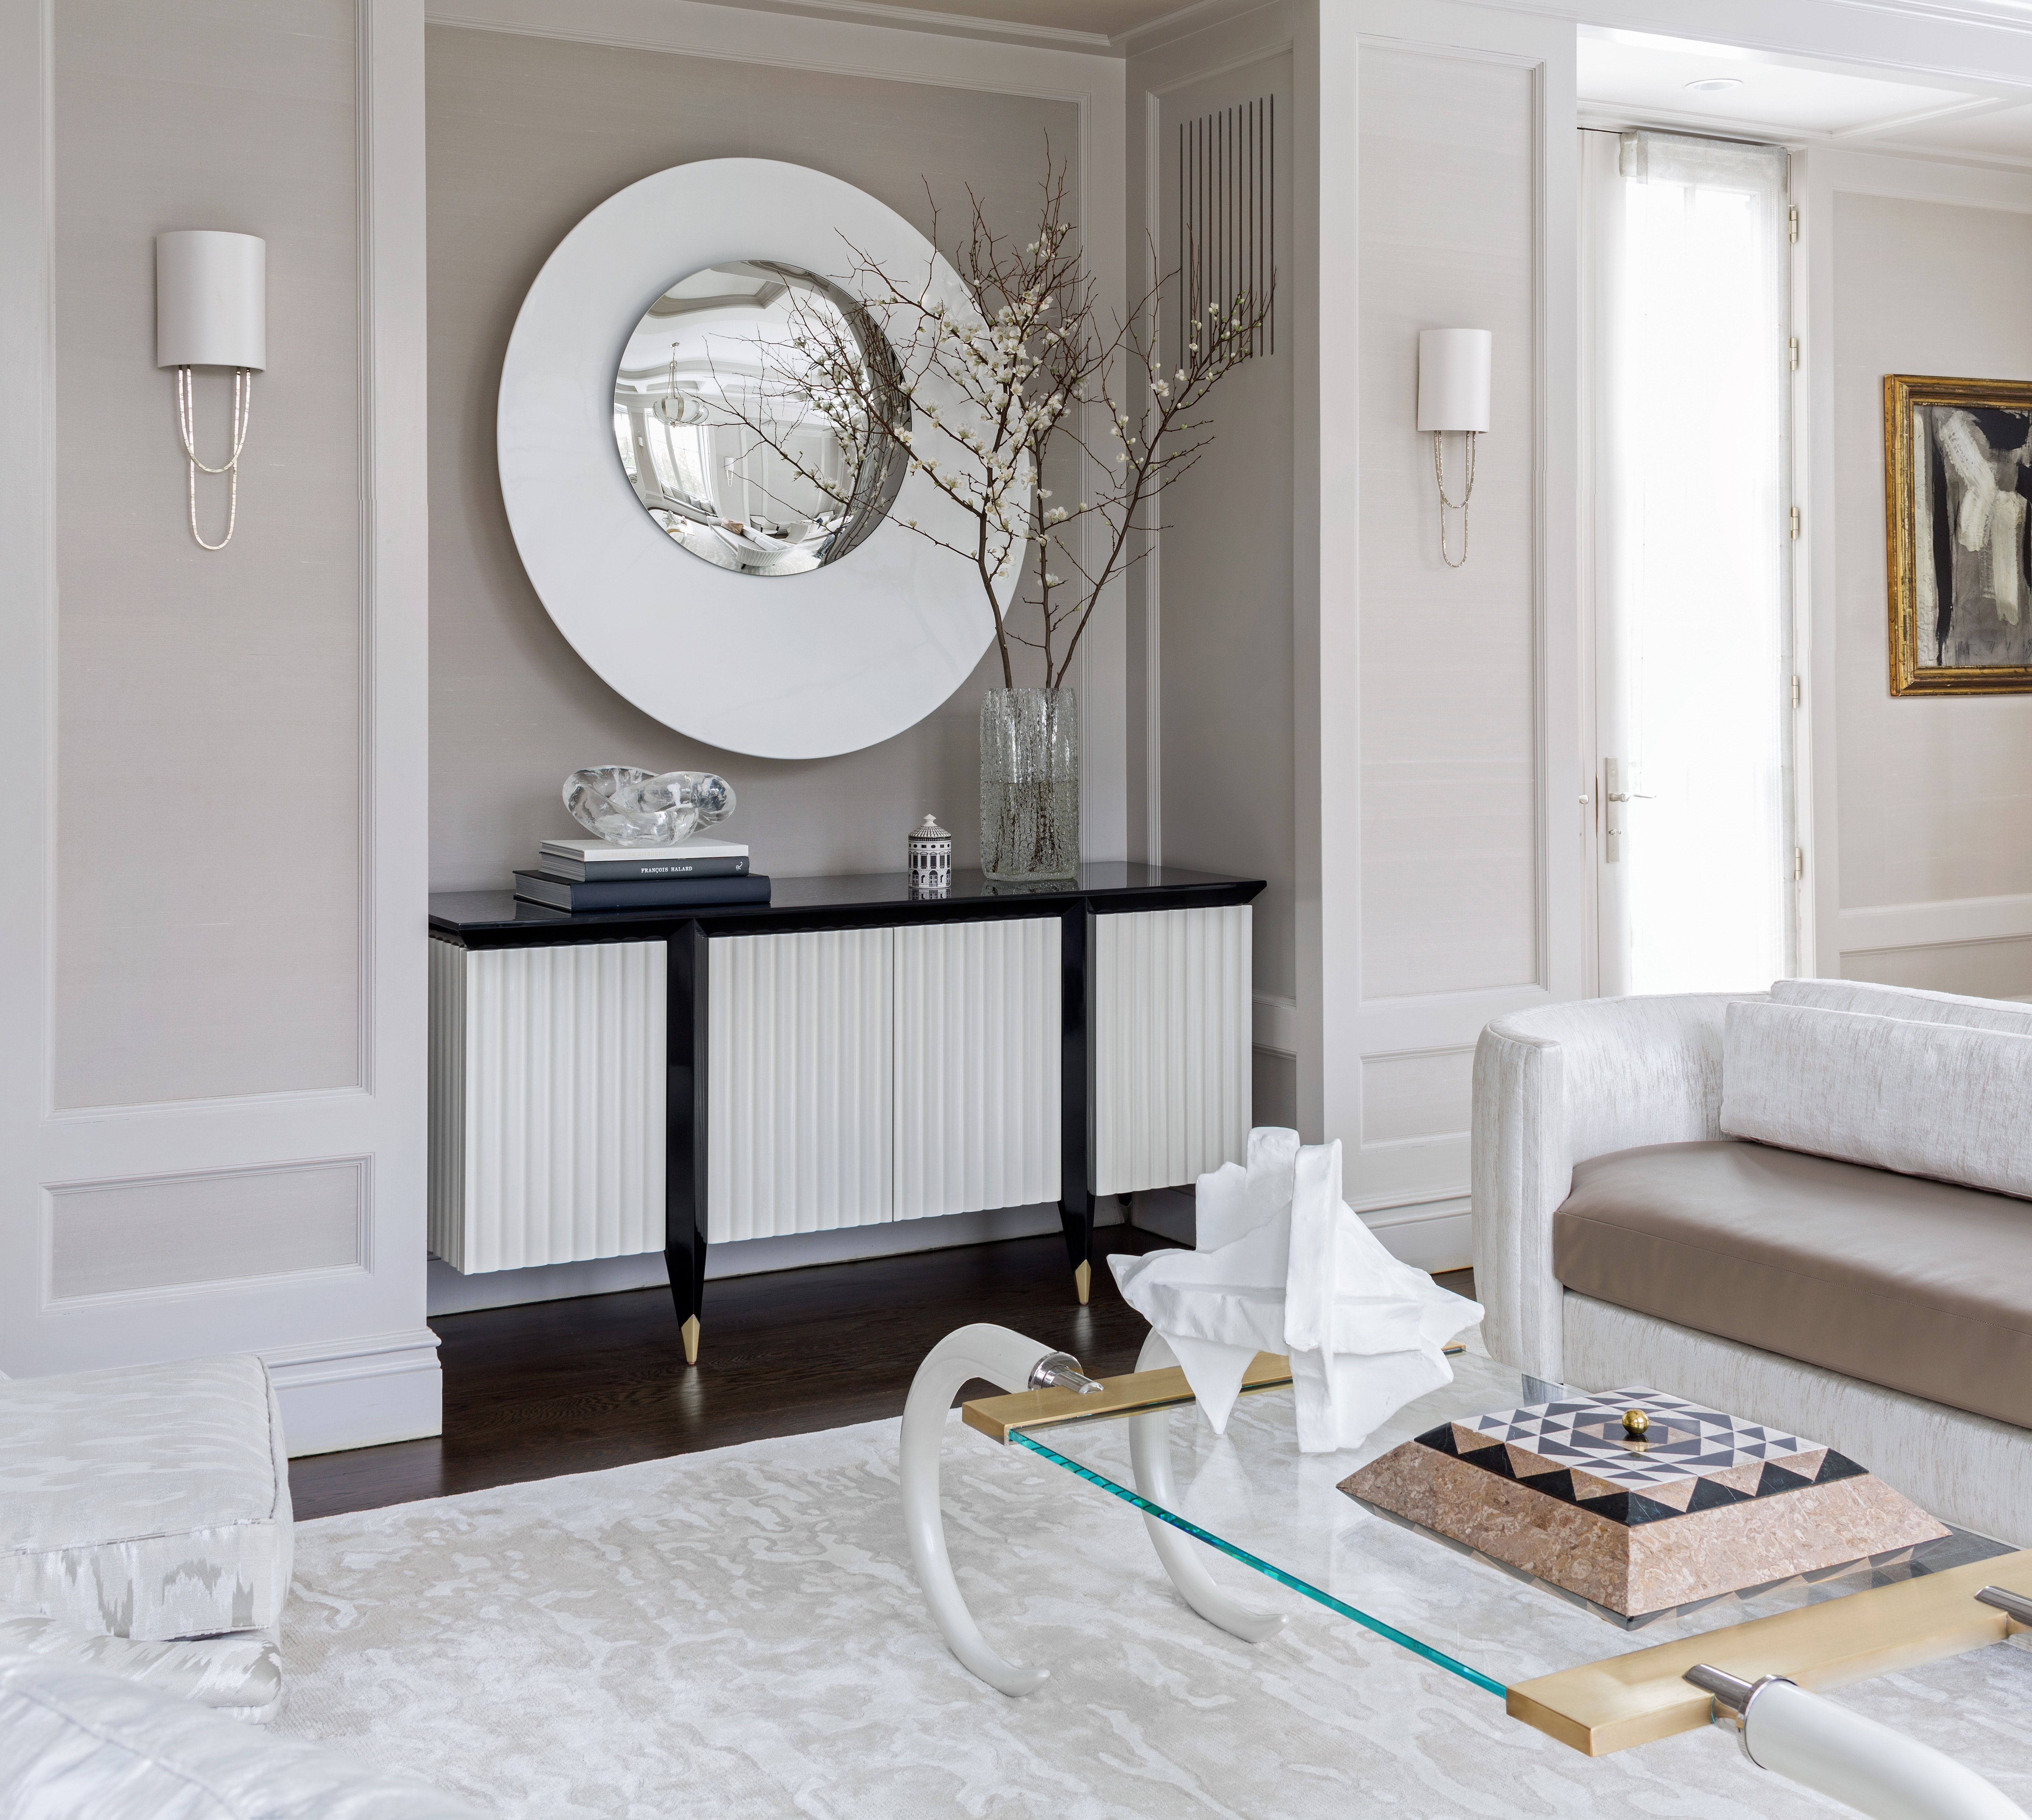 Living Hall Interior Design: Hall Interior, Interior